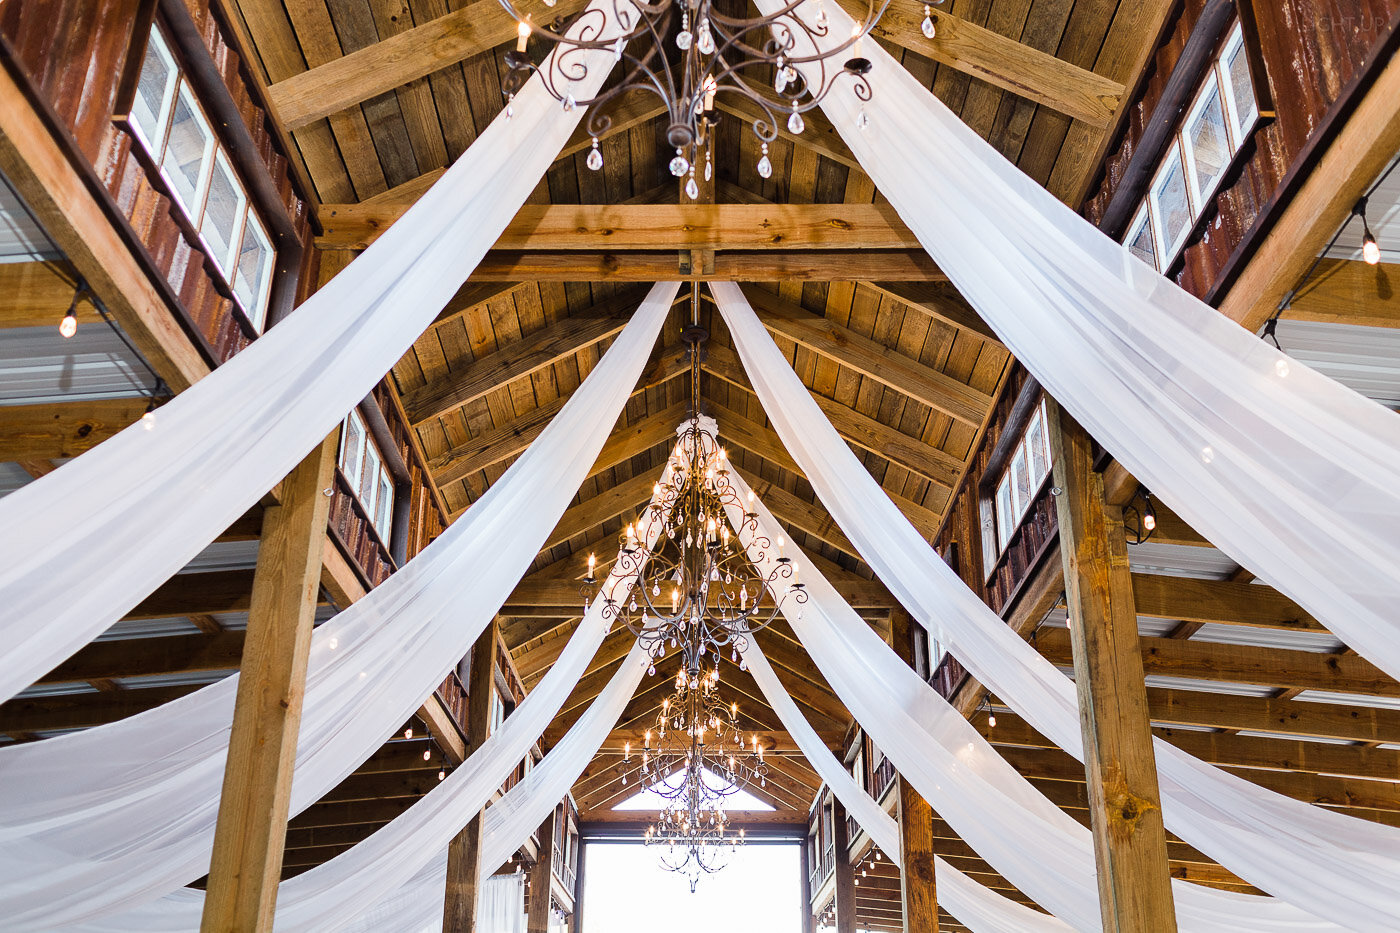 Lakeland-barn-wedding-at-white-horse-ranch-73.jpg